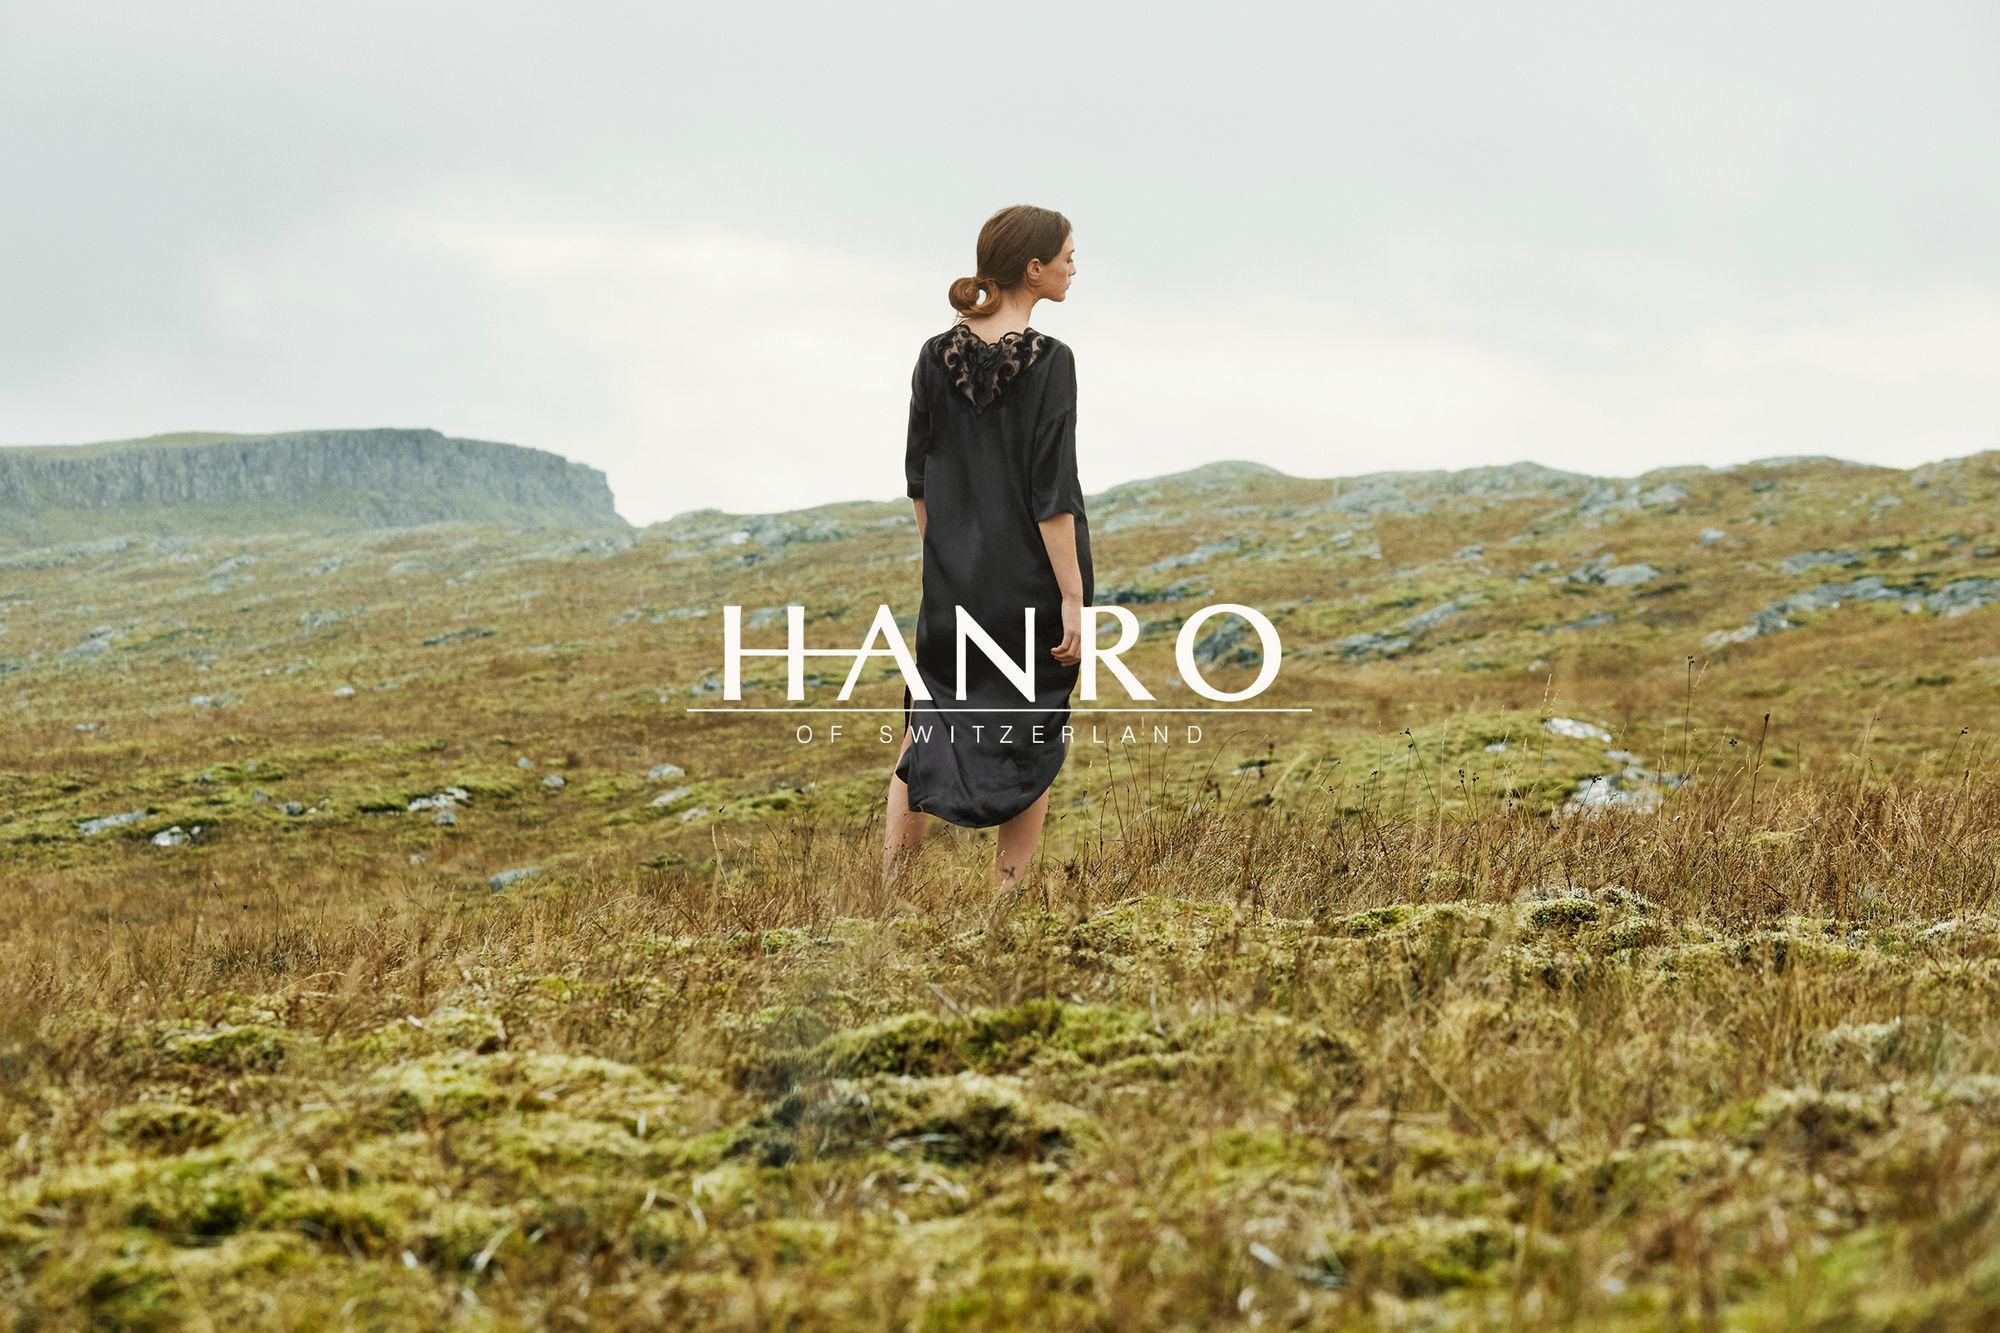 SPEEDBALL PRODUCTIONS for HANRO OF SWITZERLAND